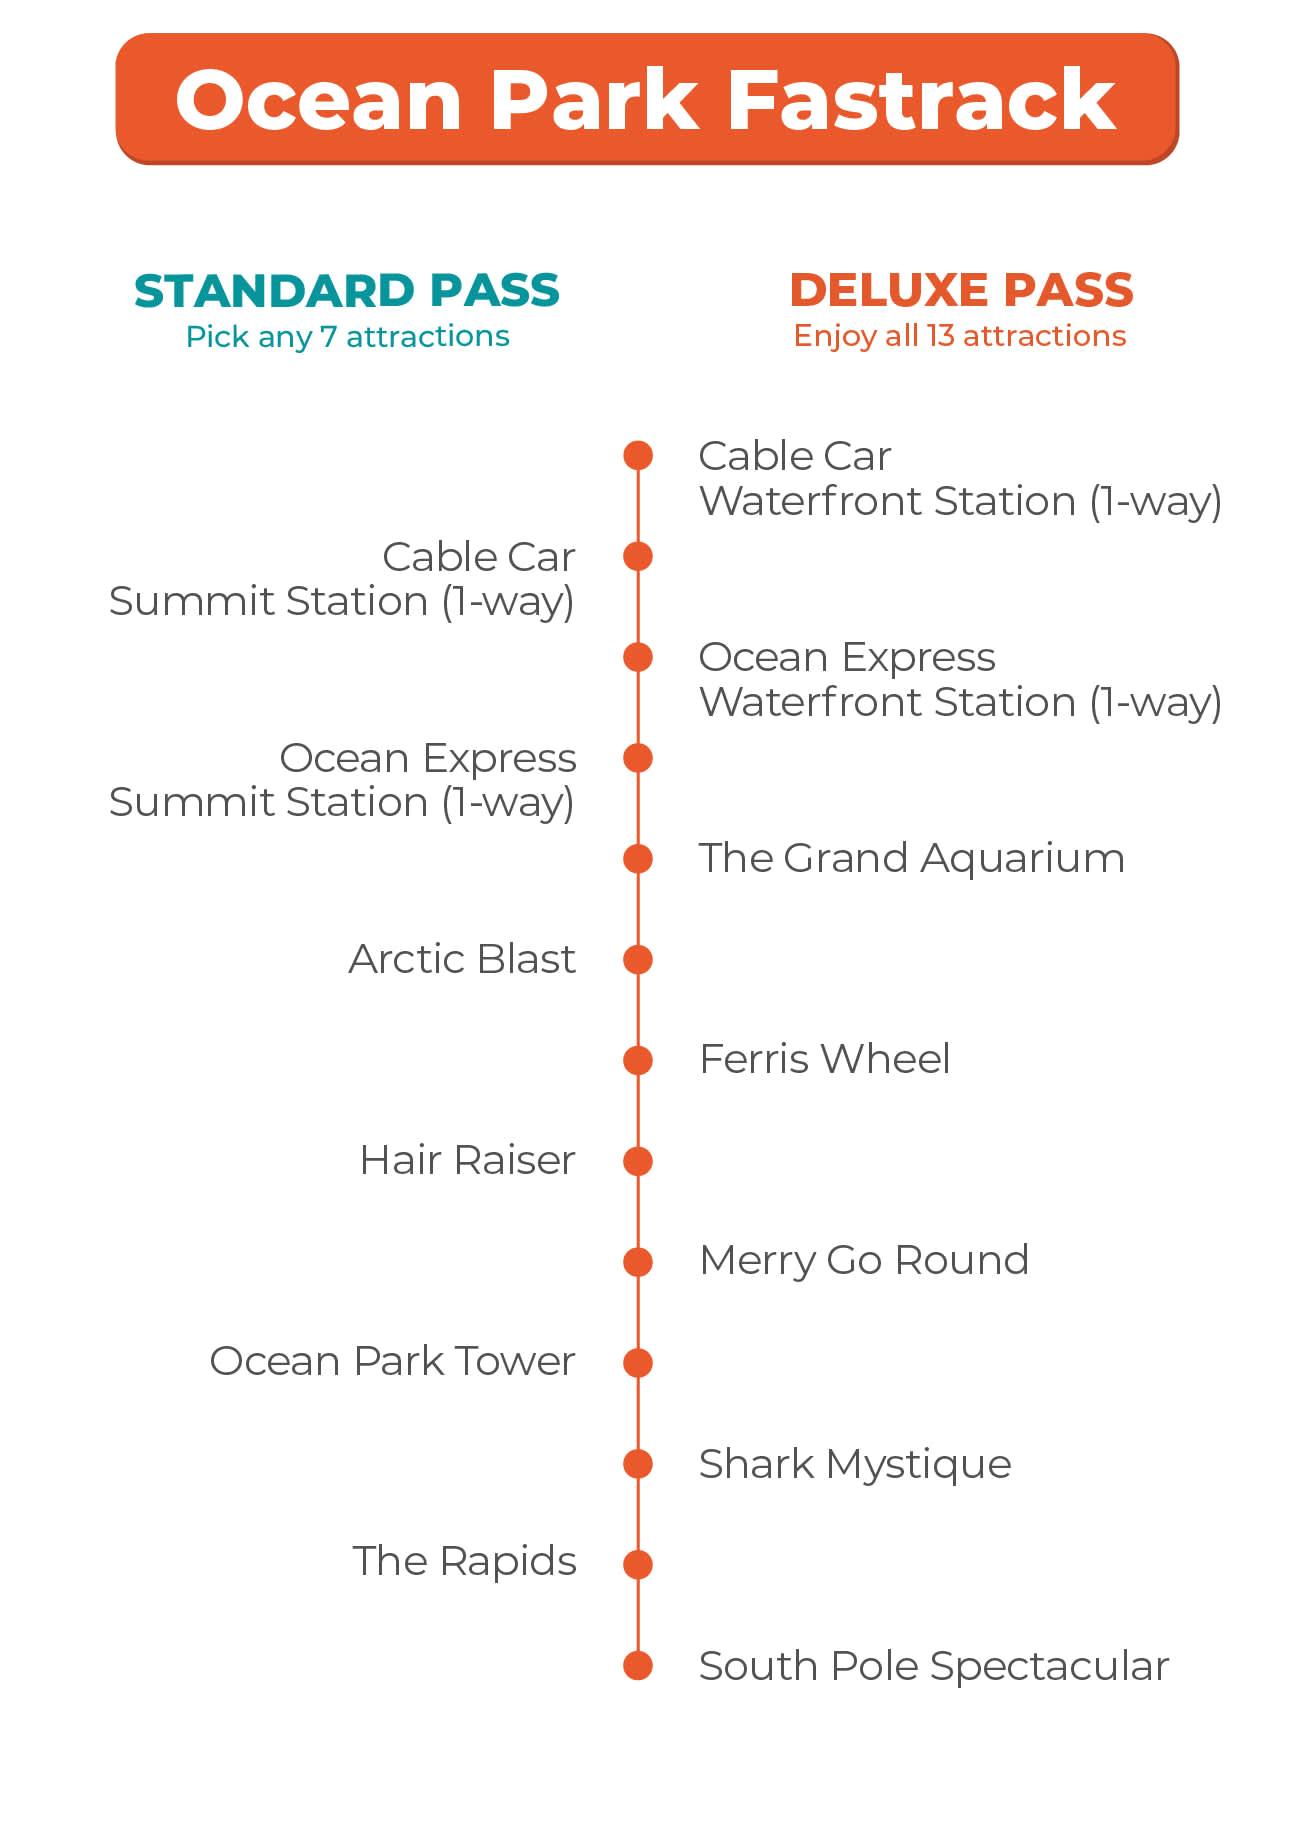 Ocean Fastrack Priority Access Guide